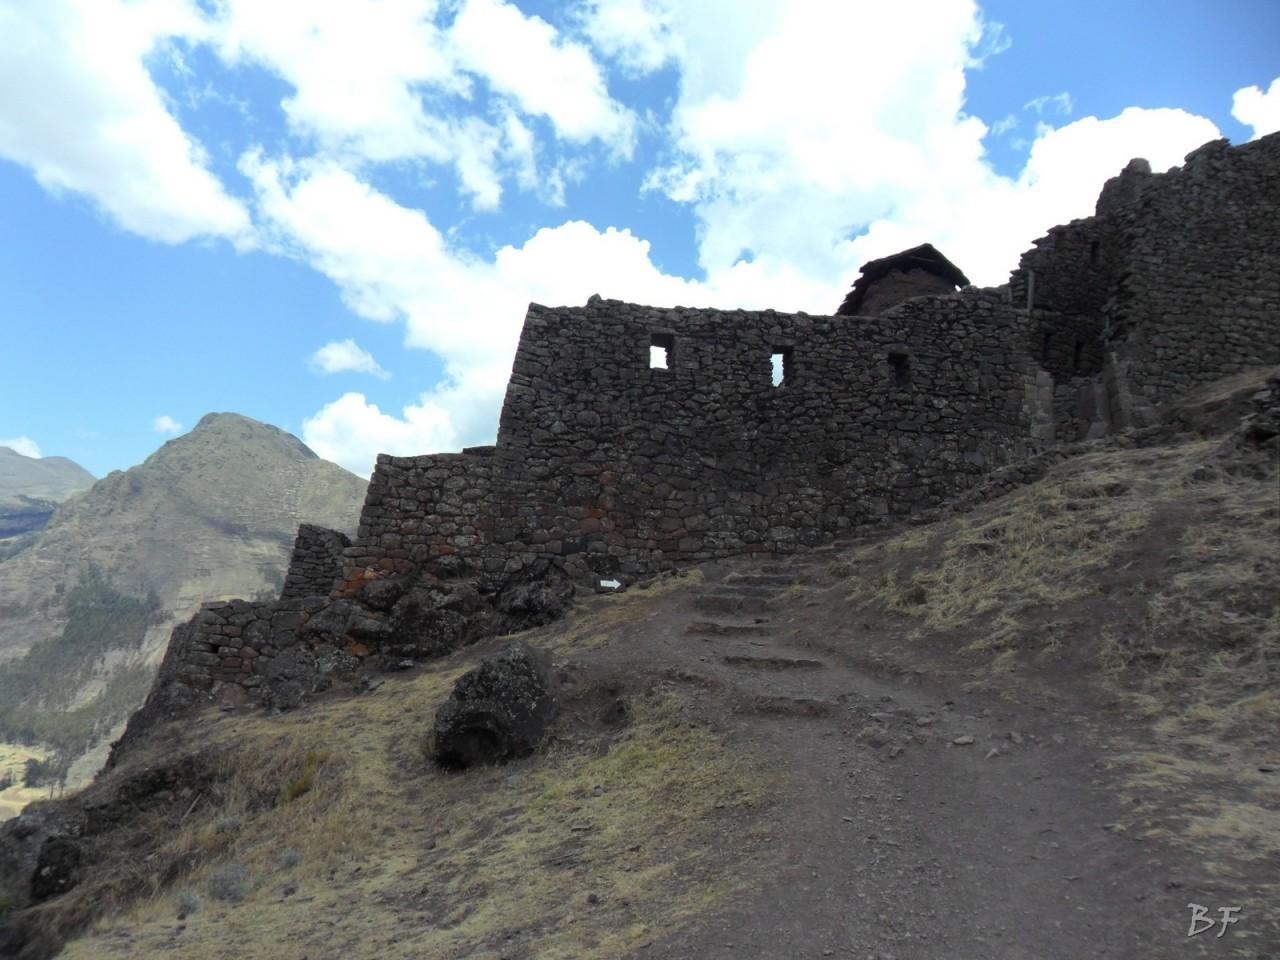 Mura-Poligonali-Megaliti-Altari-Rupestri-Pisac-Cusco-Perù-21